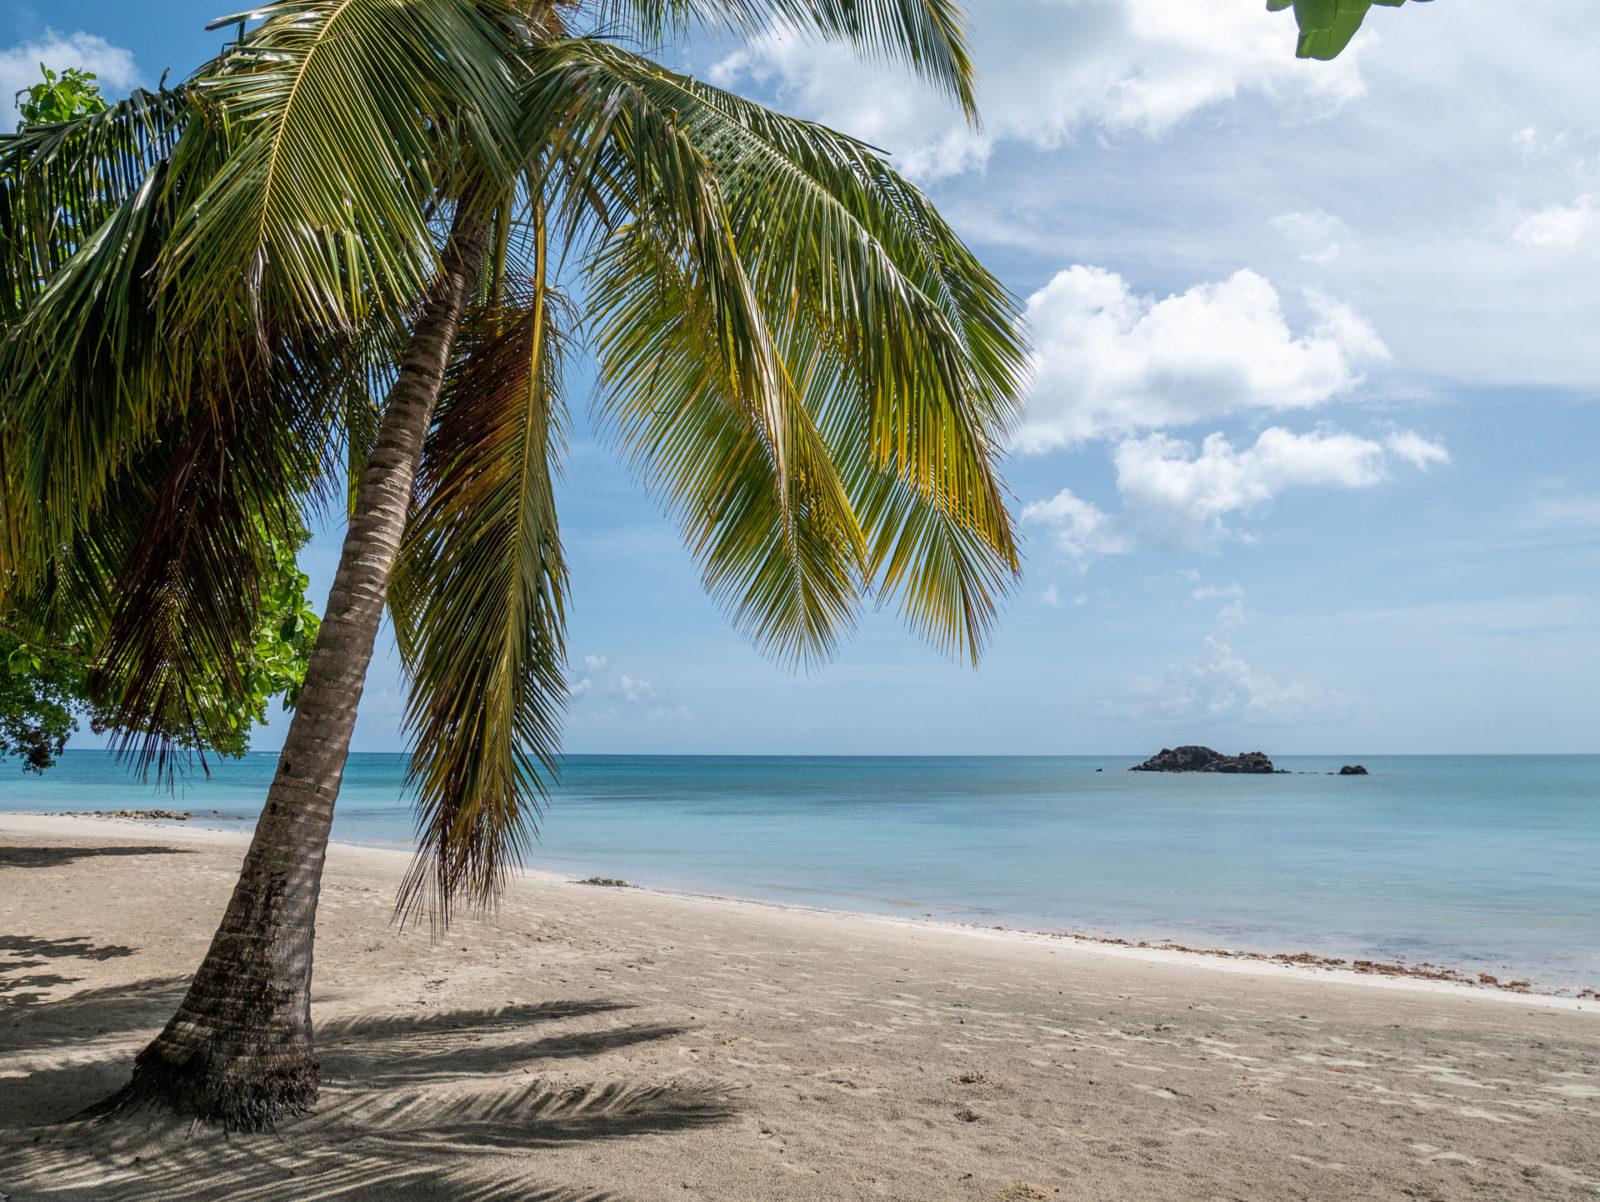 Southwest Bay Providencia Island